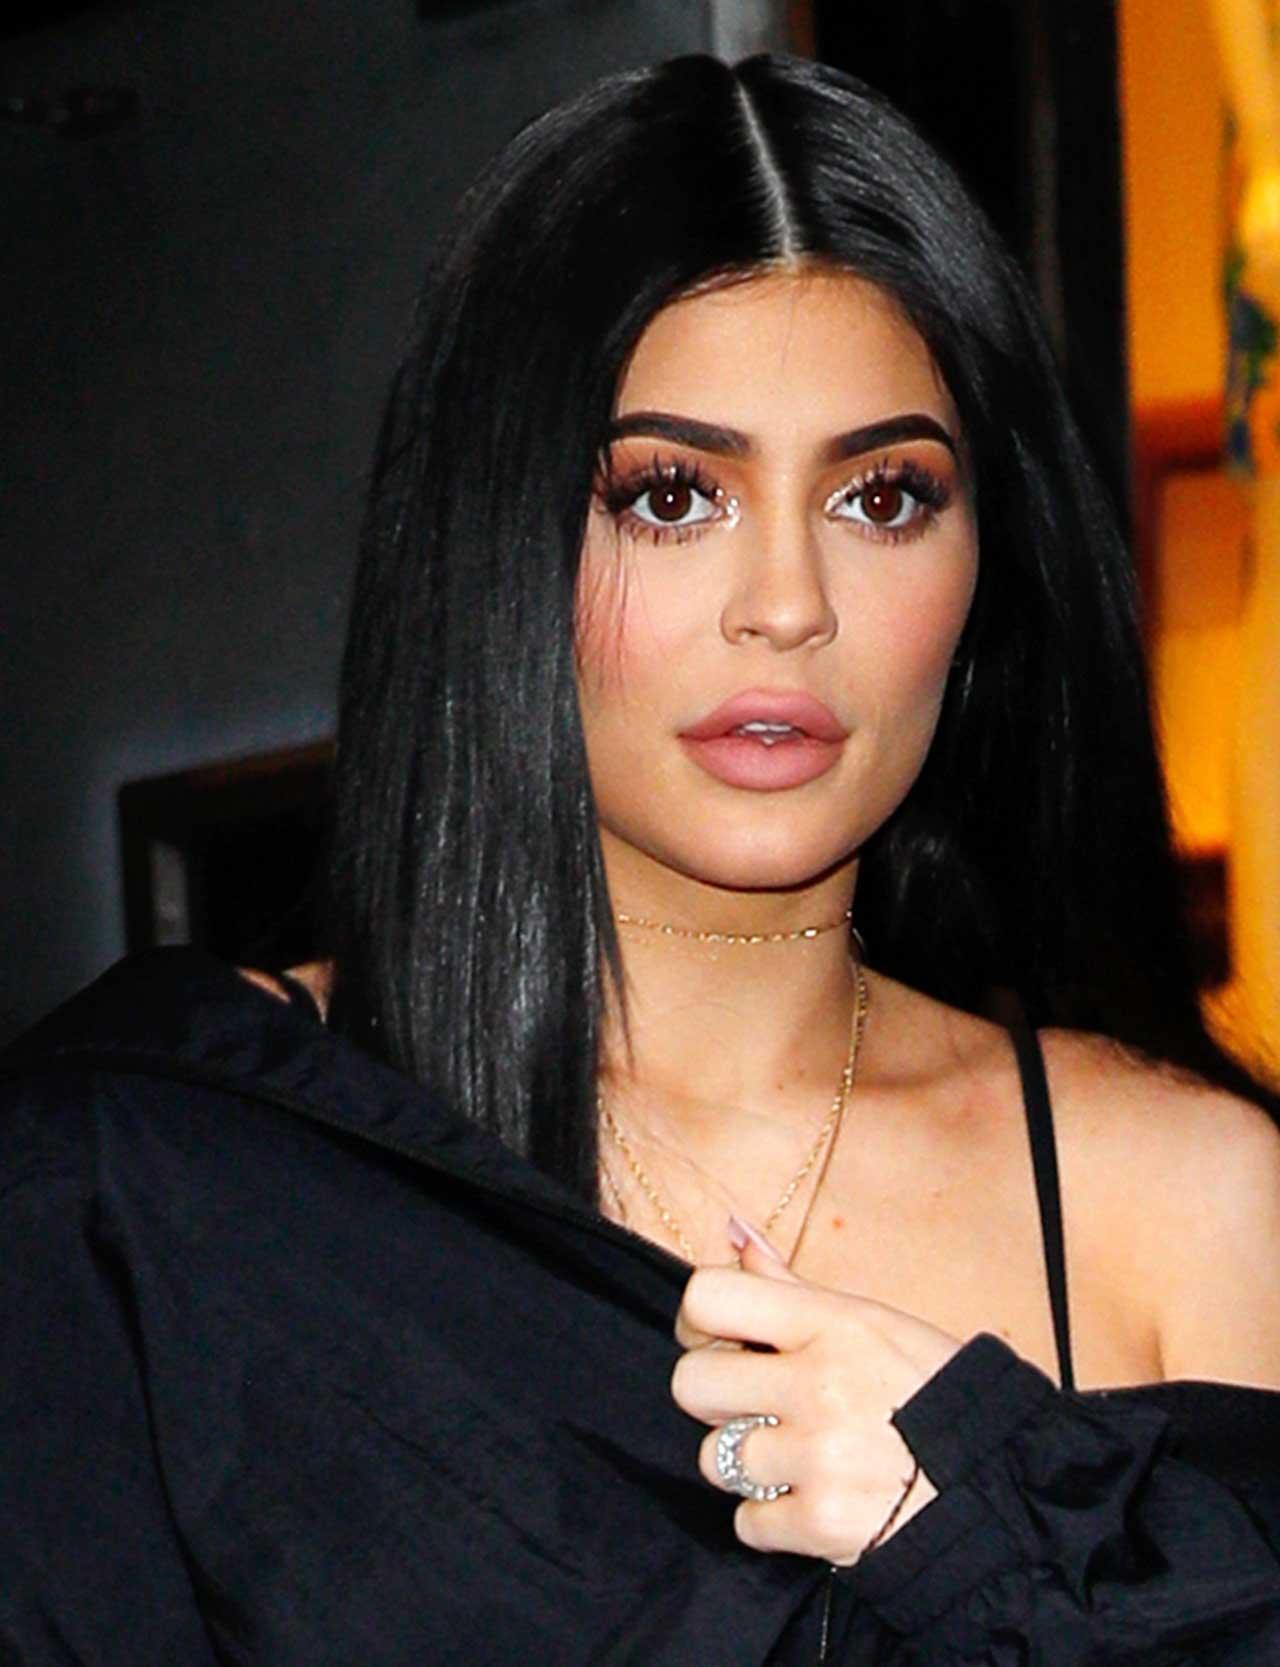 Photos Kylie Jenner: Kylie Jenner Hot & Sexy Hottest Photos Unseen Sexiest